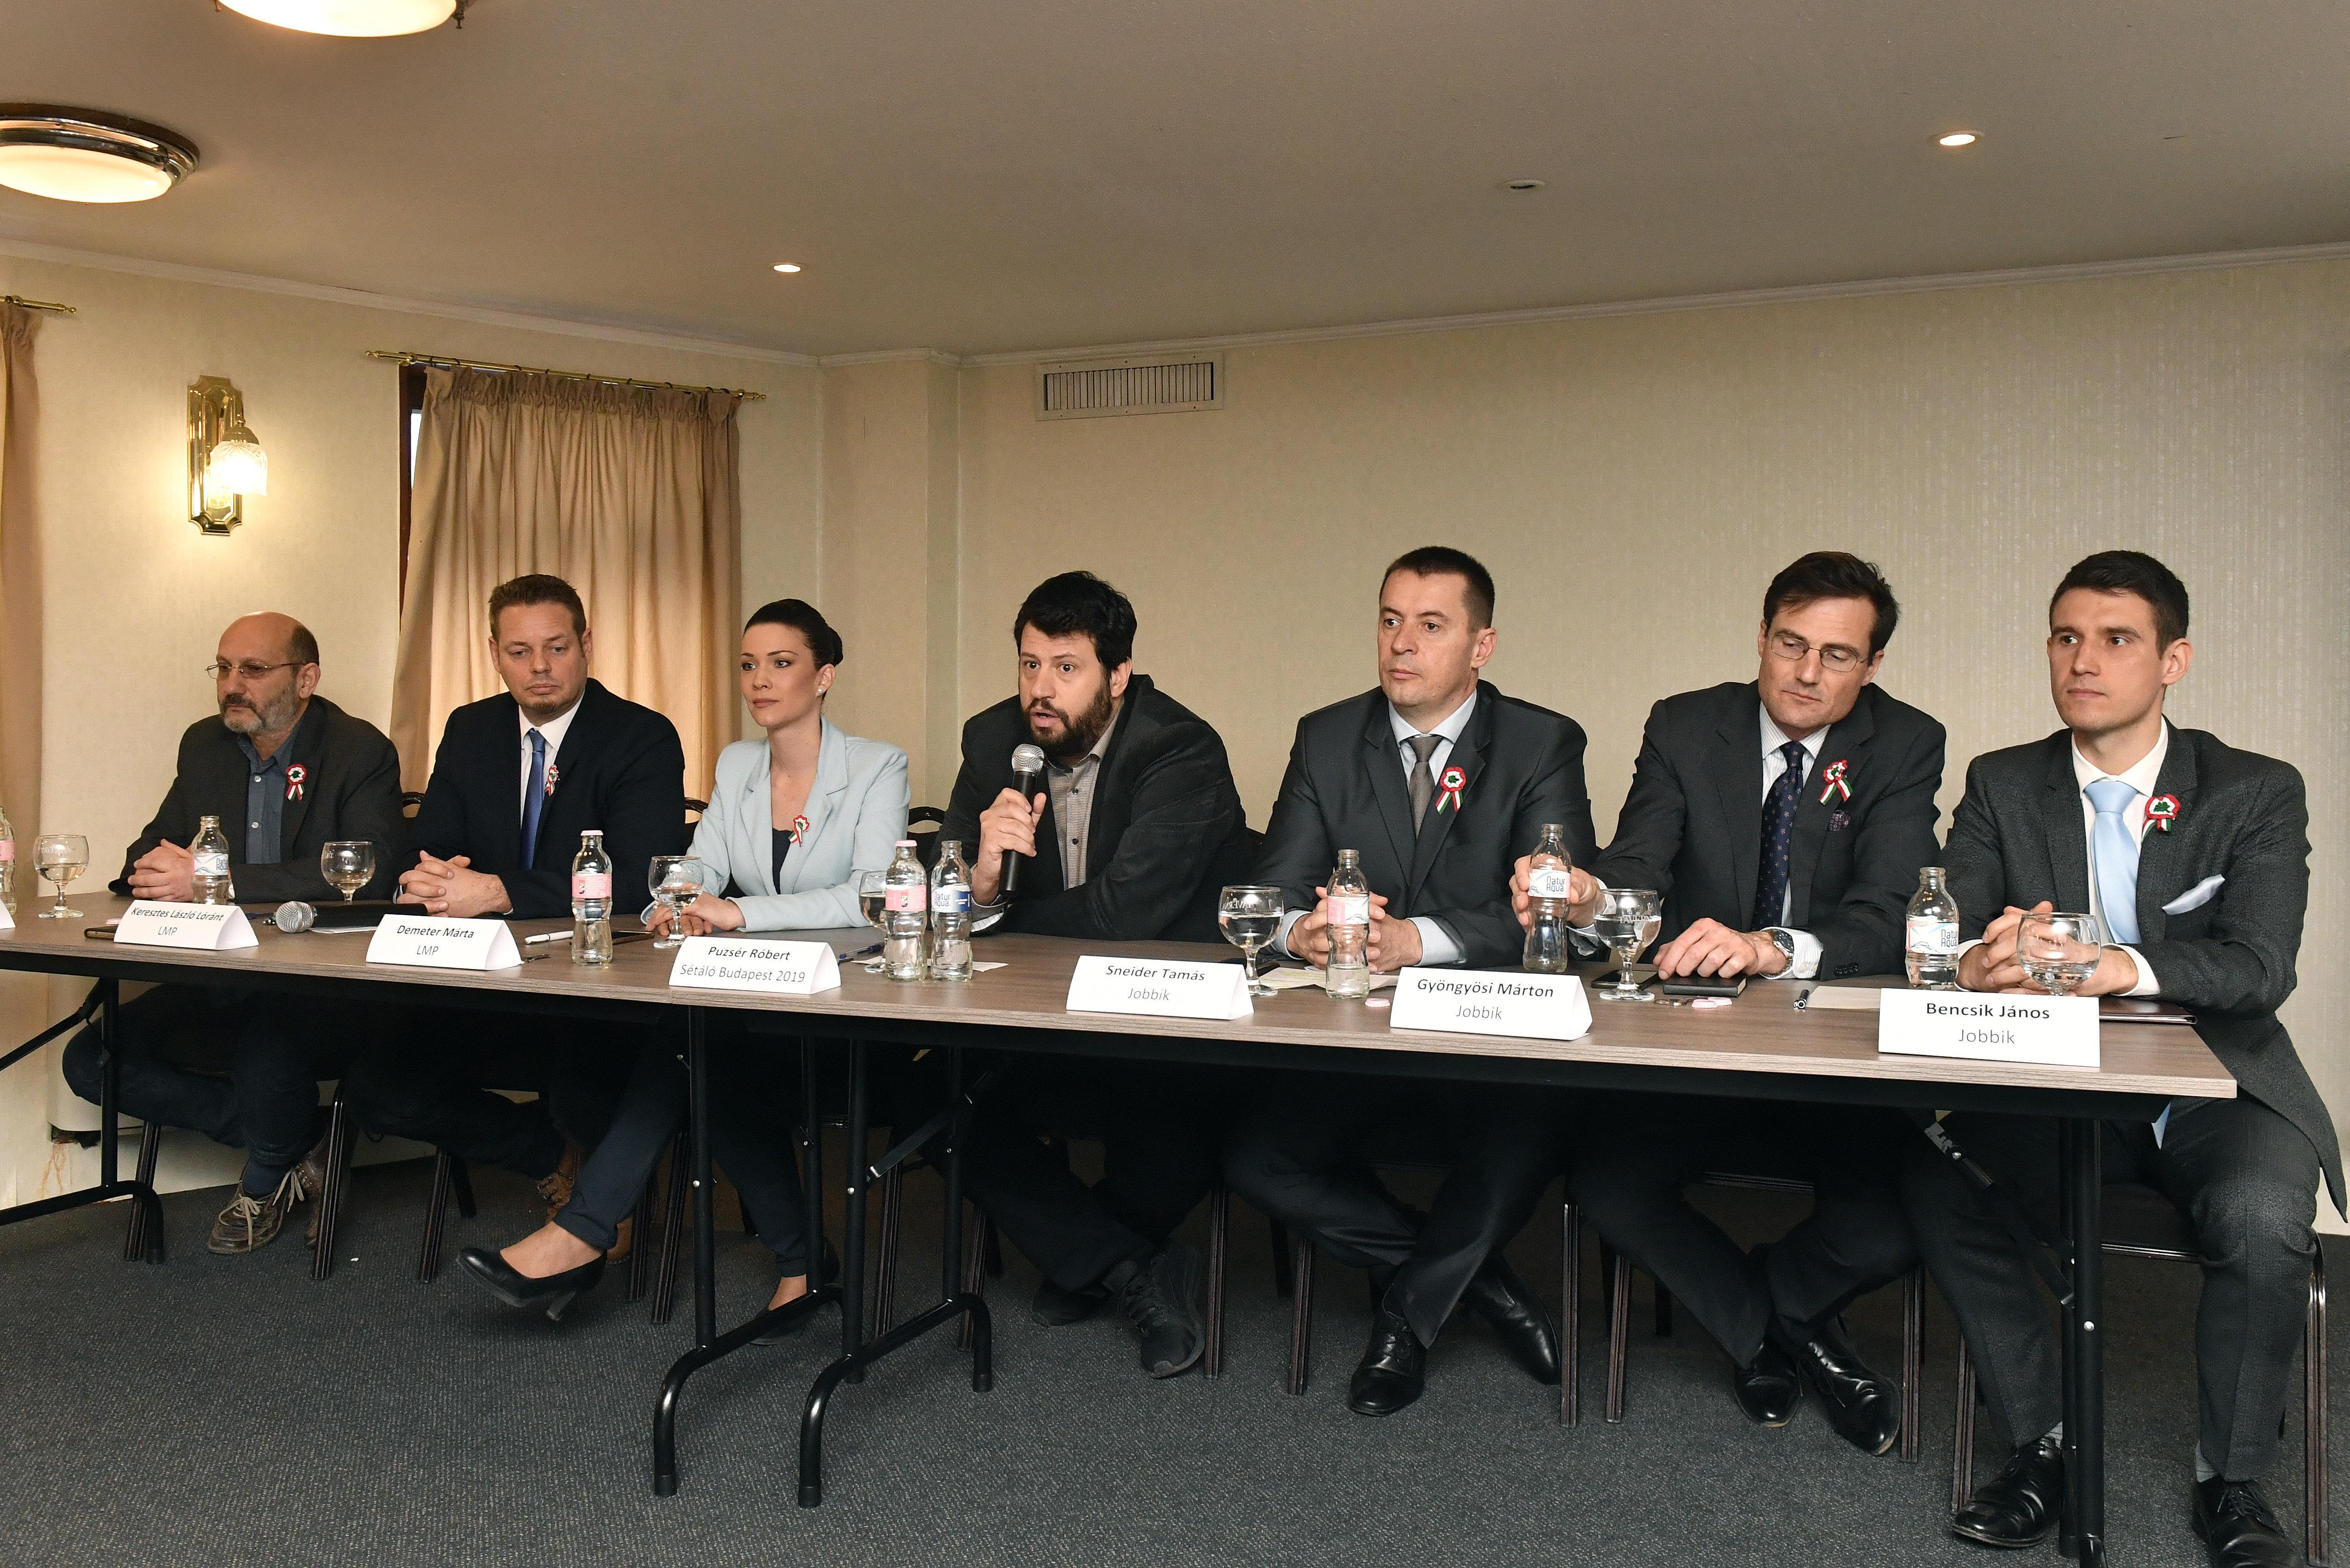 LMP Jobbik municipial 2019 election Budapest Puzsér